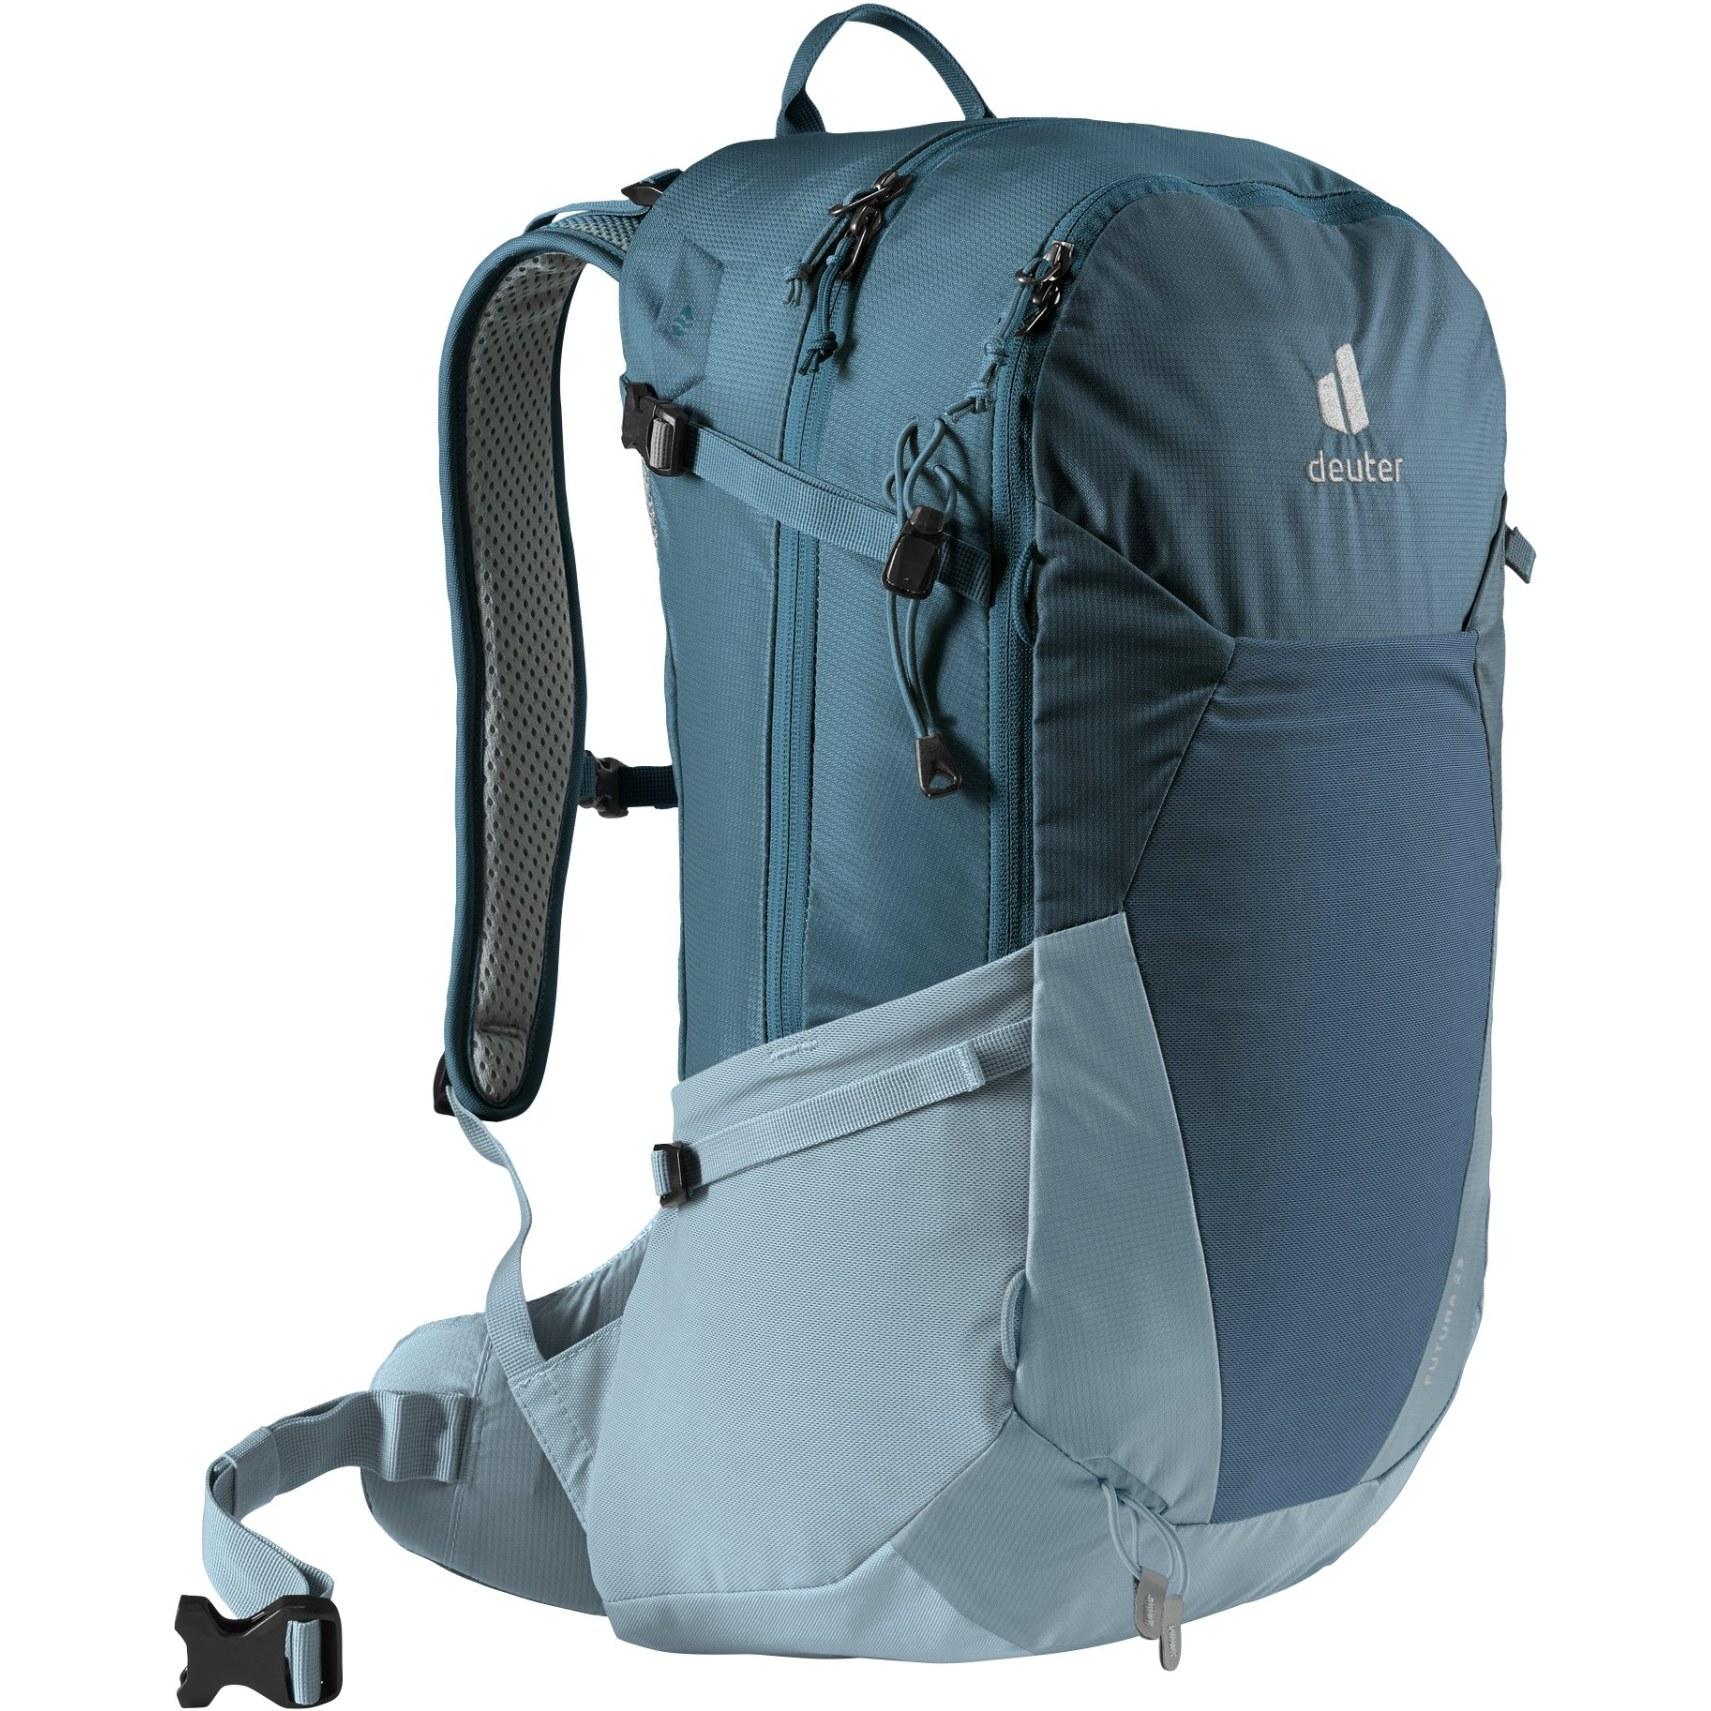 Deuter Futura 23 Backpack - arctic-slateblue